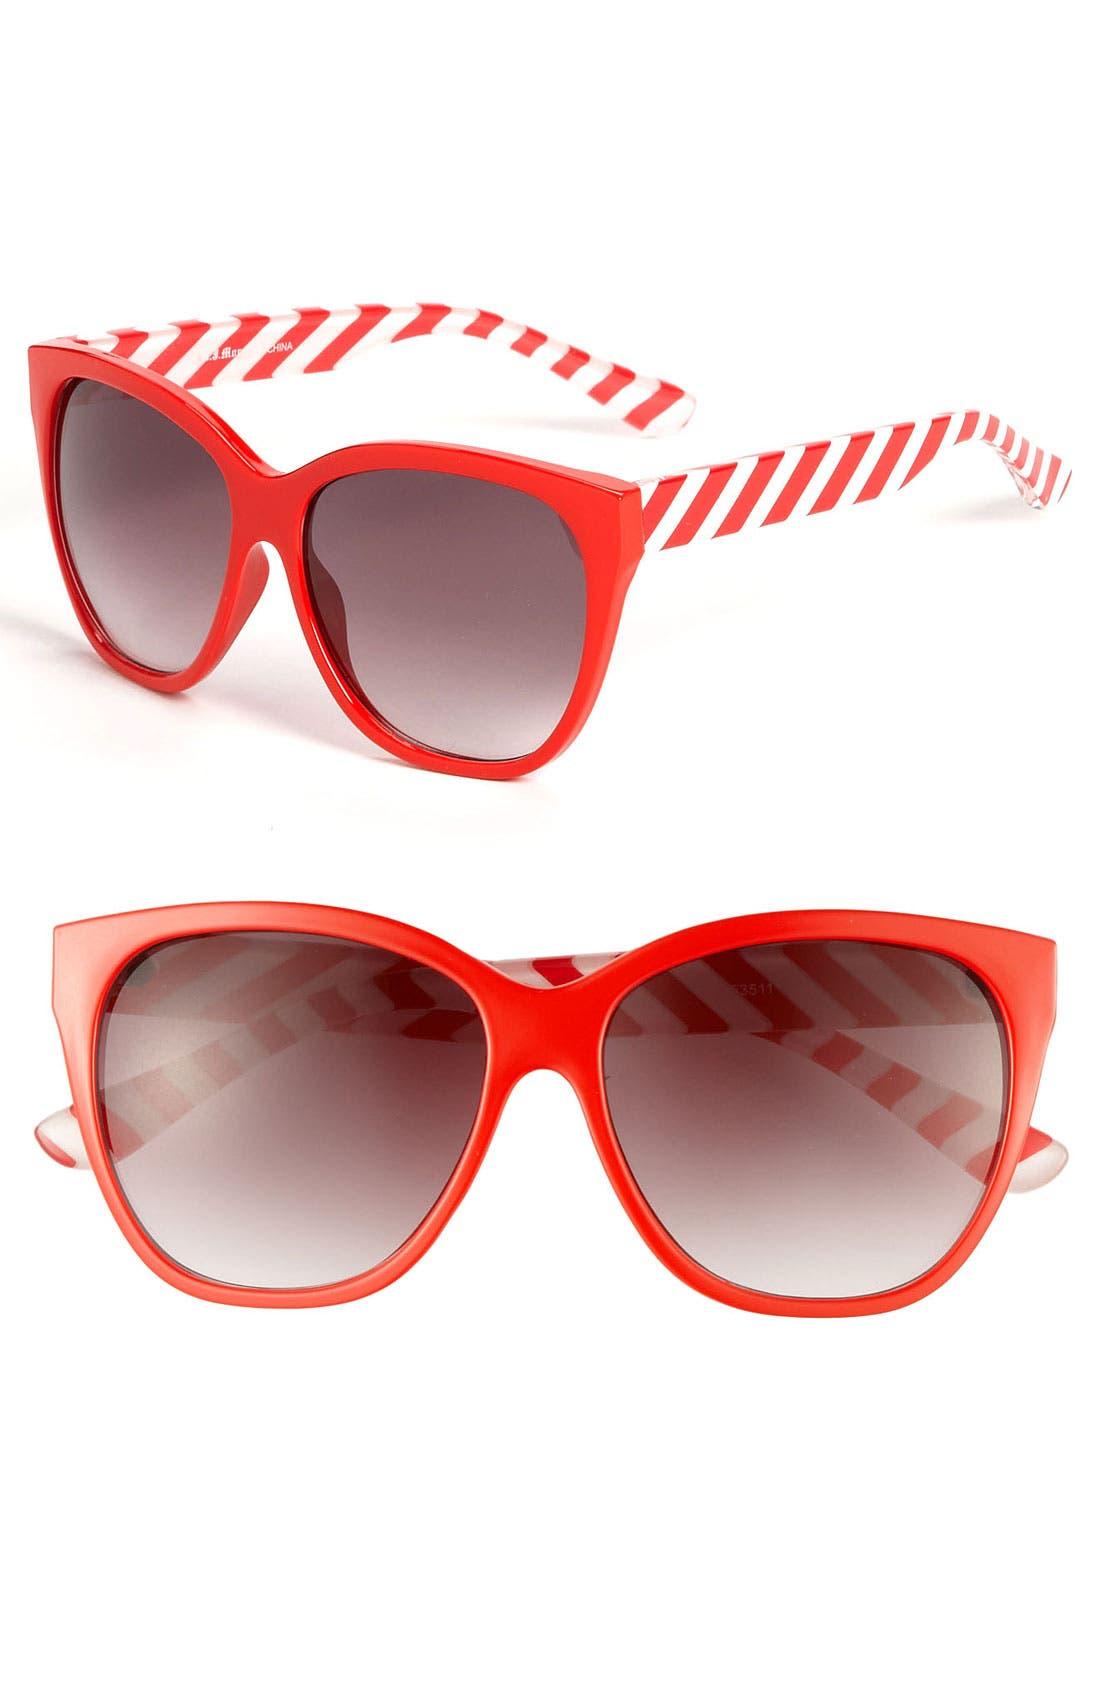 Main Image - A.J. Morgan 'Cha Cha' Sunglasses